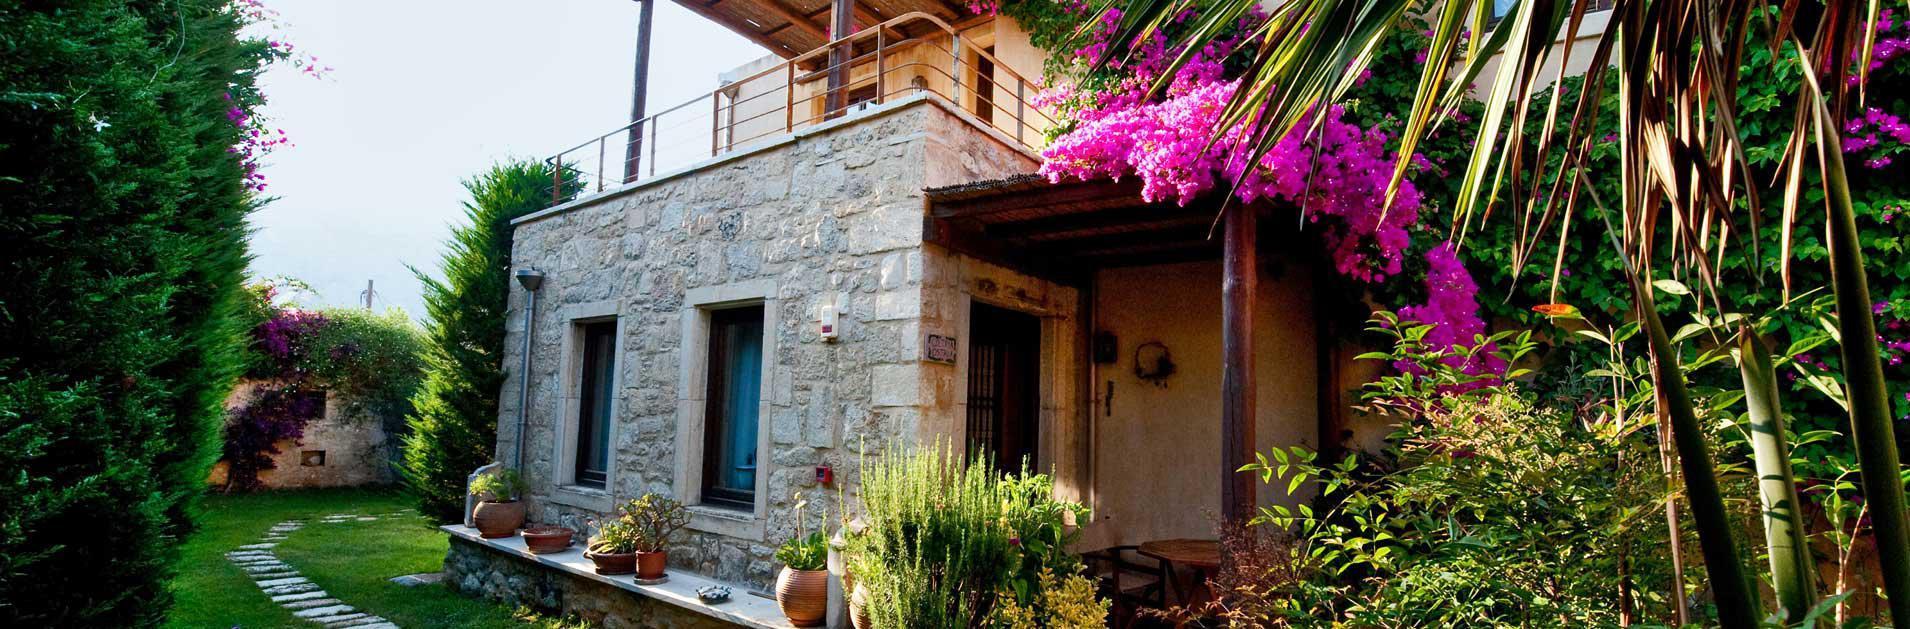 Drei traditionelle Villas